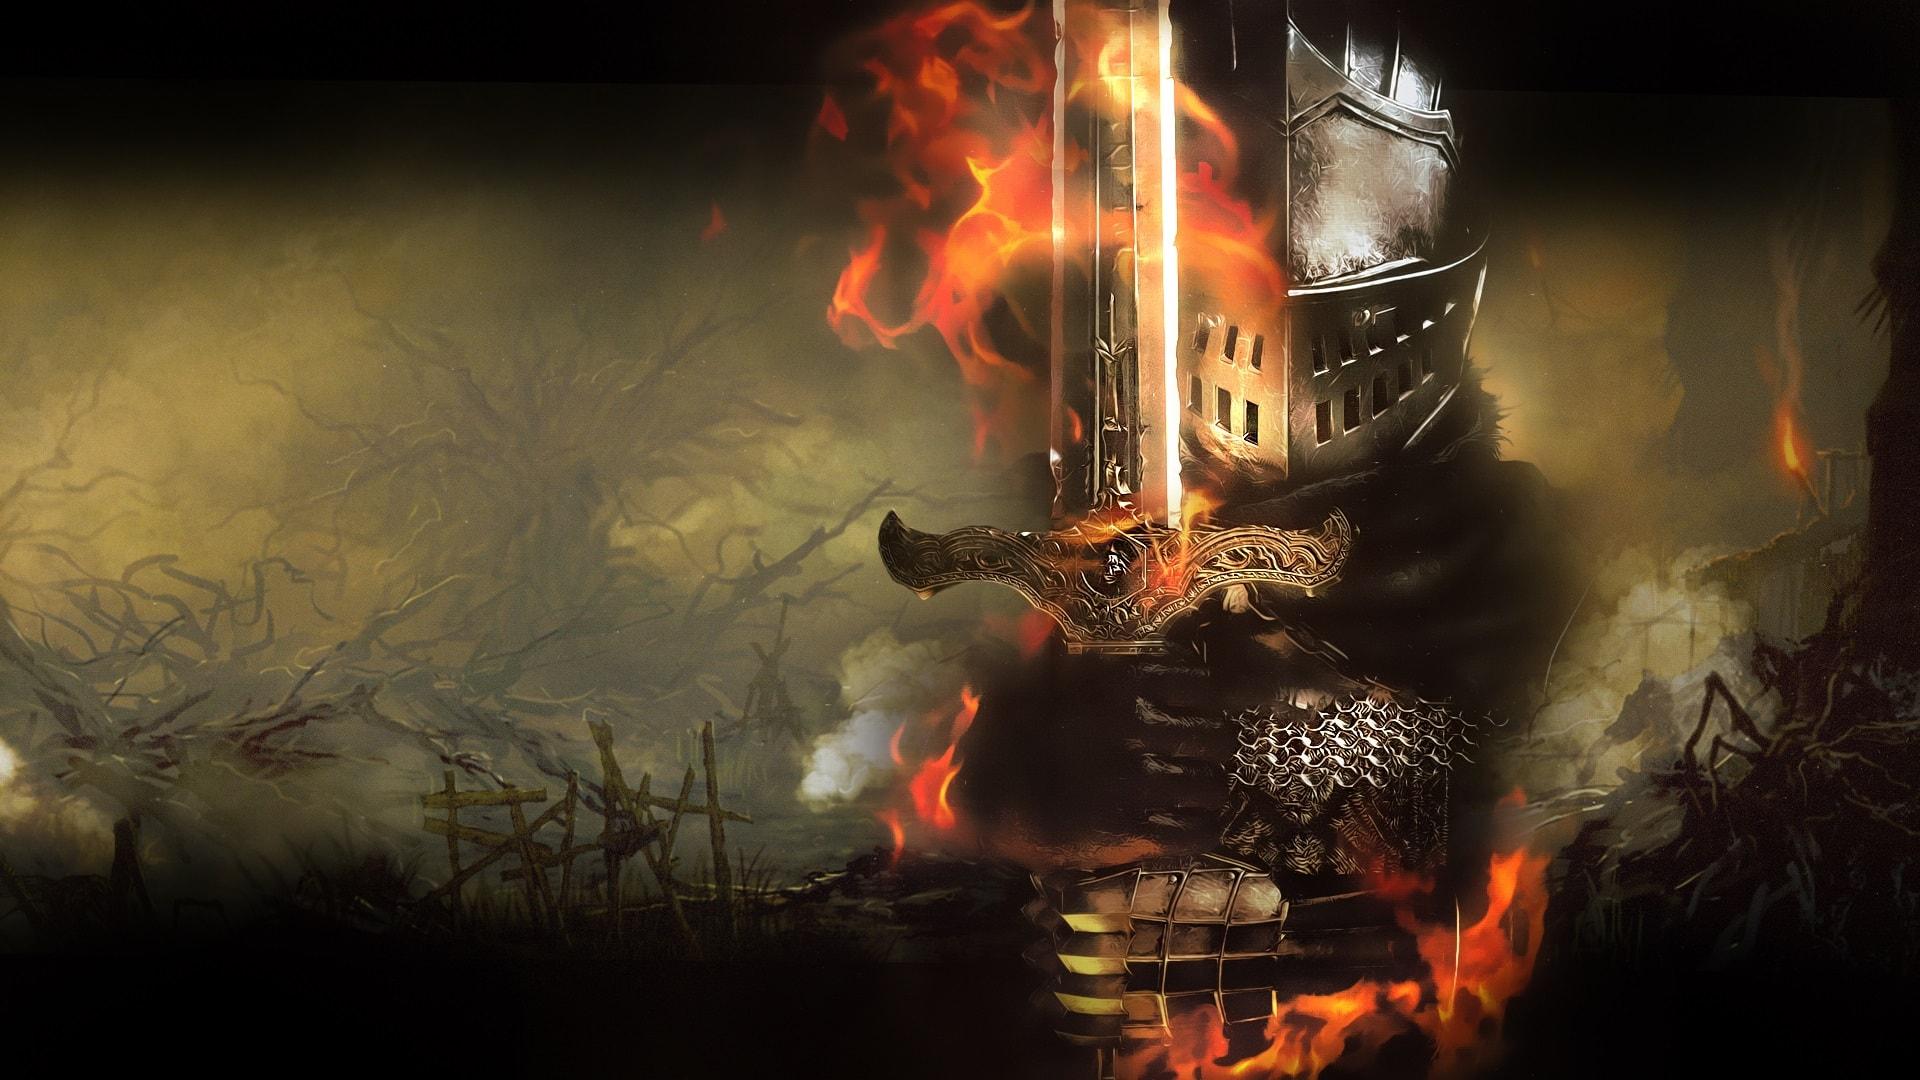 Dark Souls 2 Hd Wallpapers 7wallpapers Net